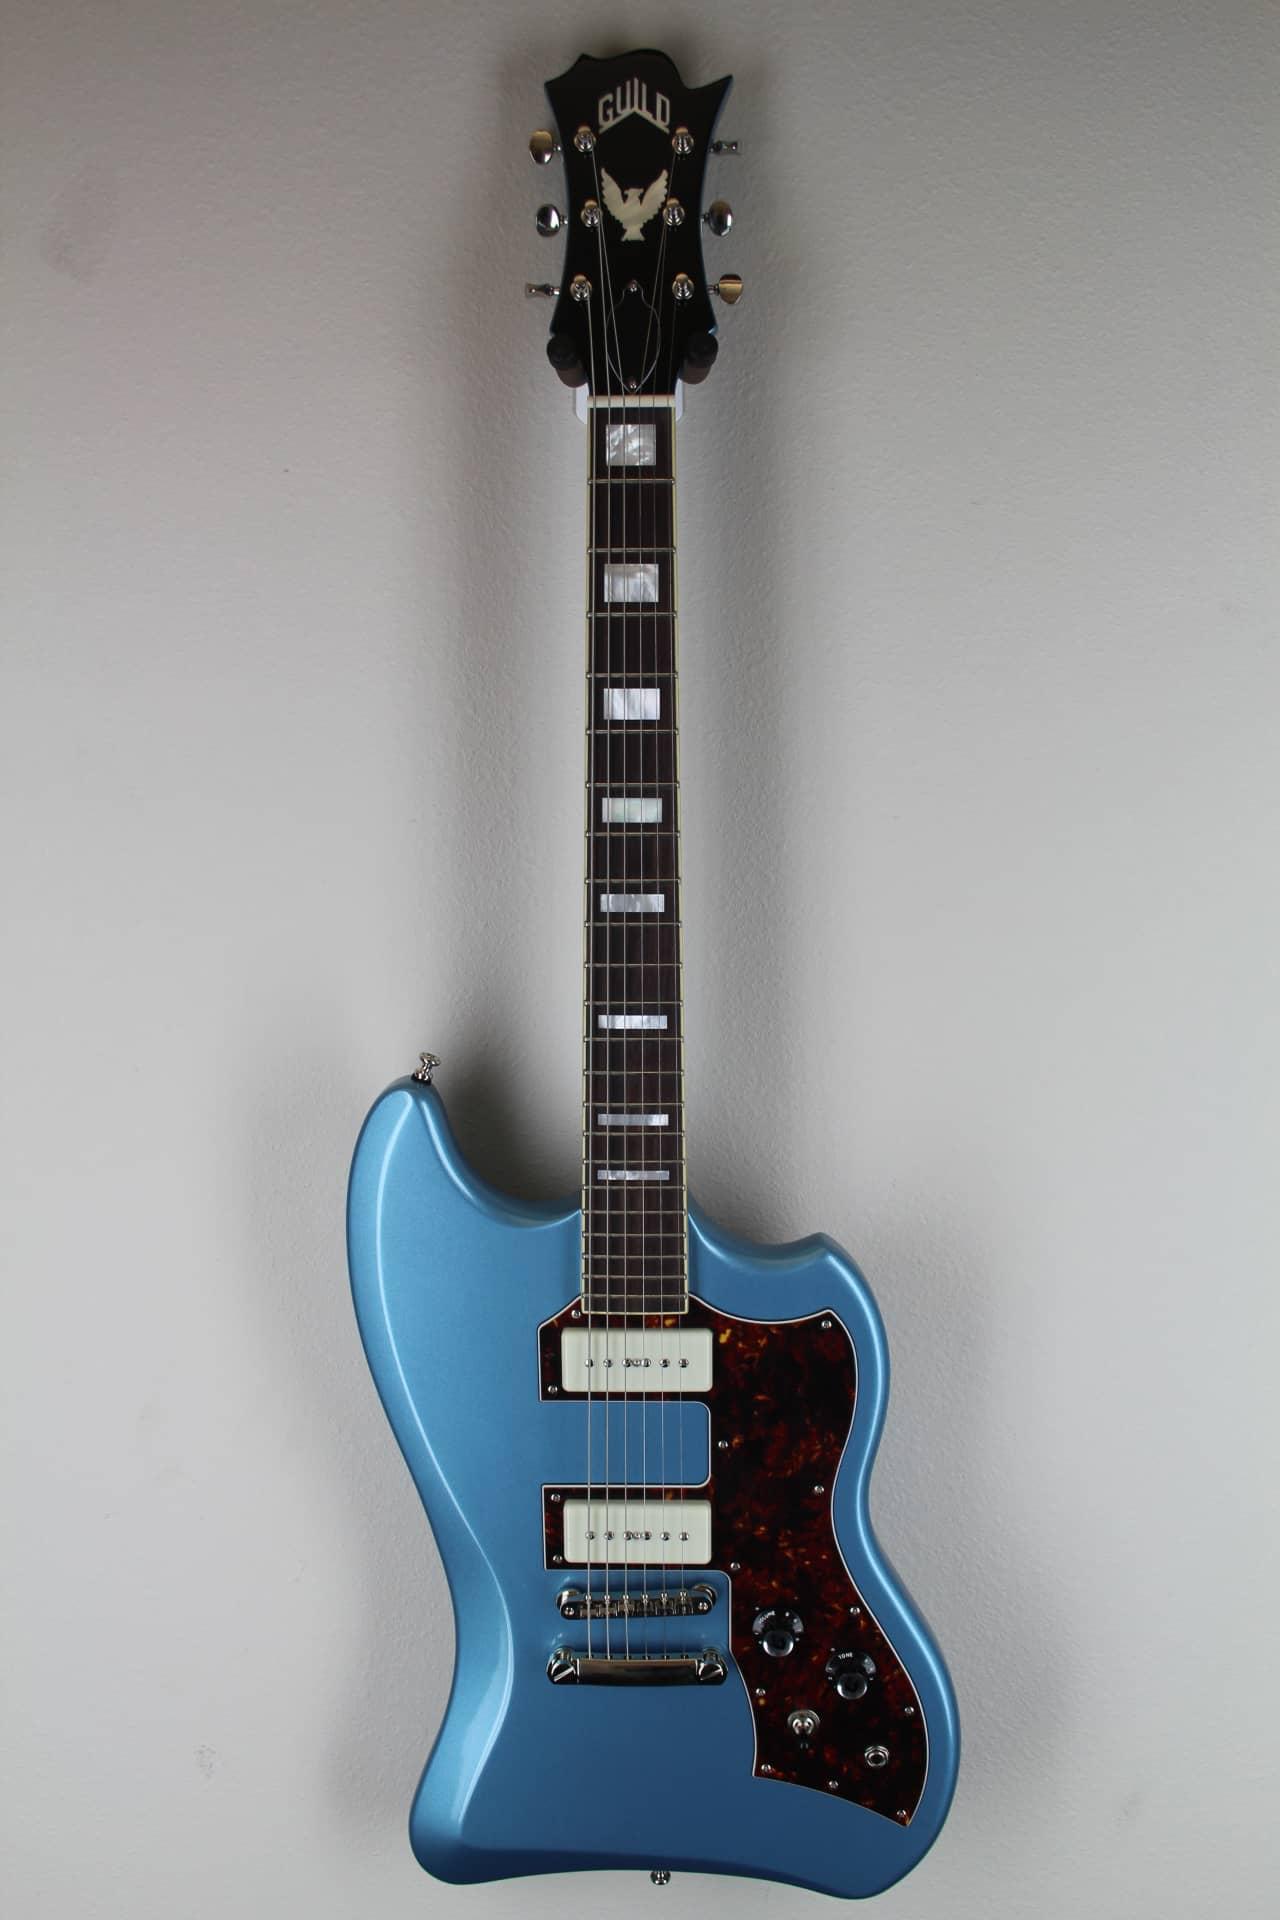 guild t bird st p90 solid body pelham blue electric guitar reverb. Black Bedroom Furniture Sets. Home Design Ideas